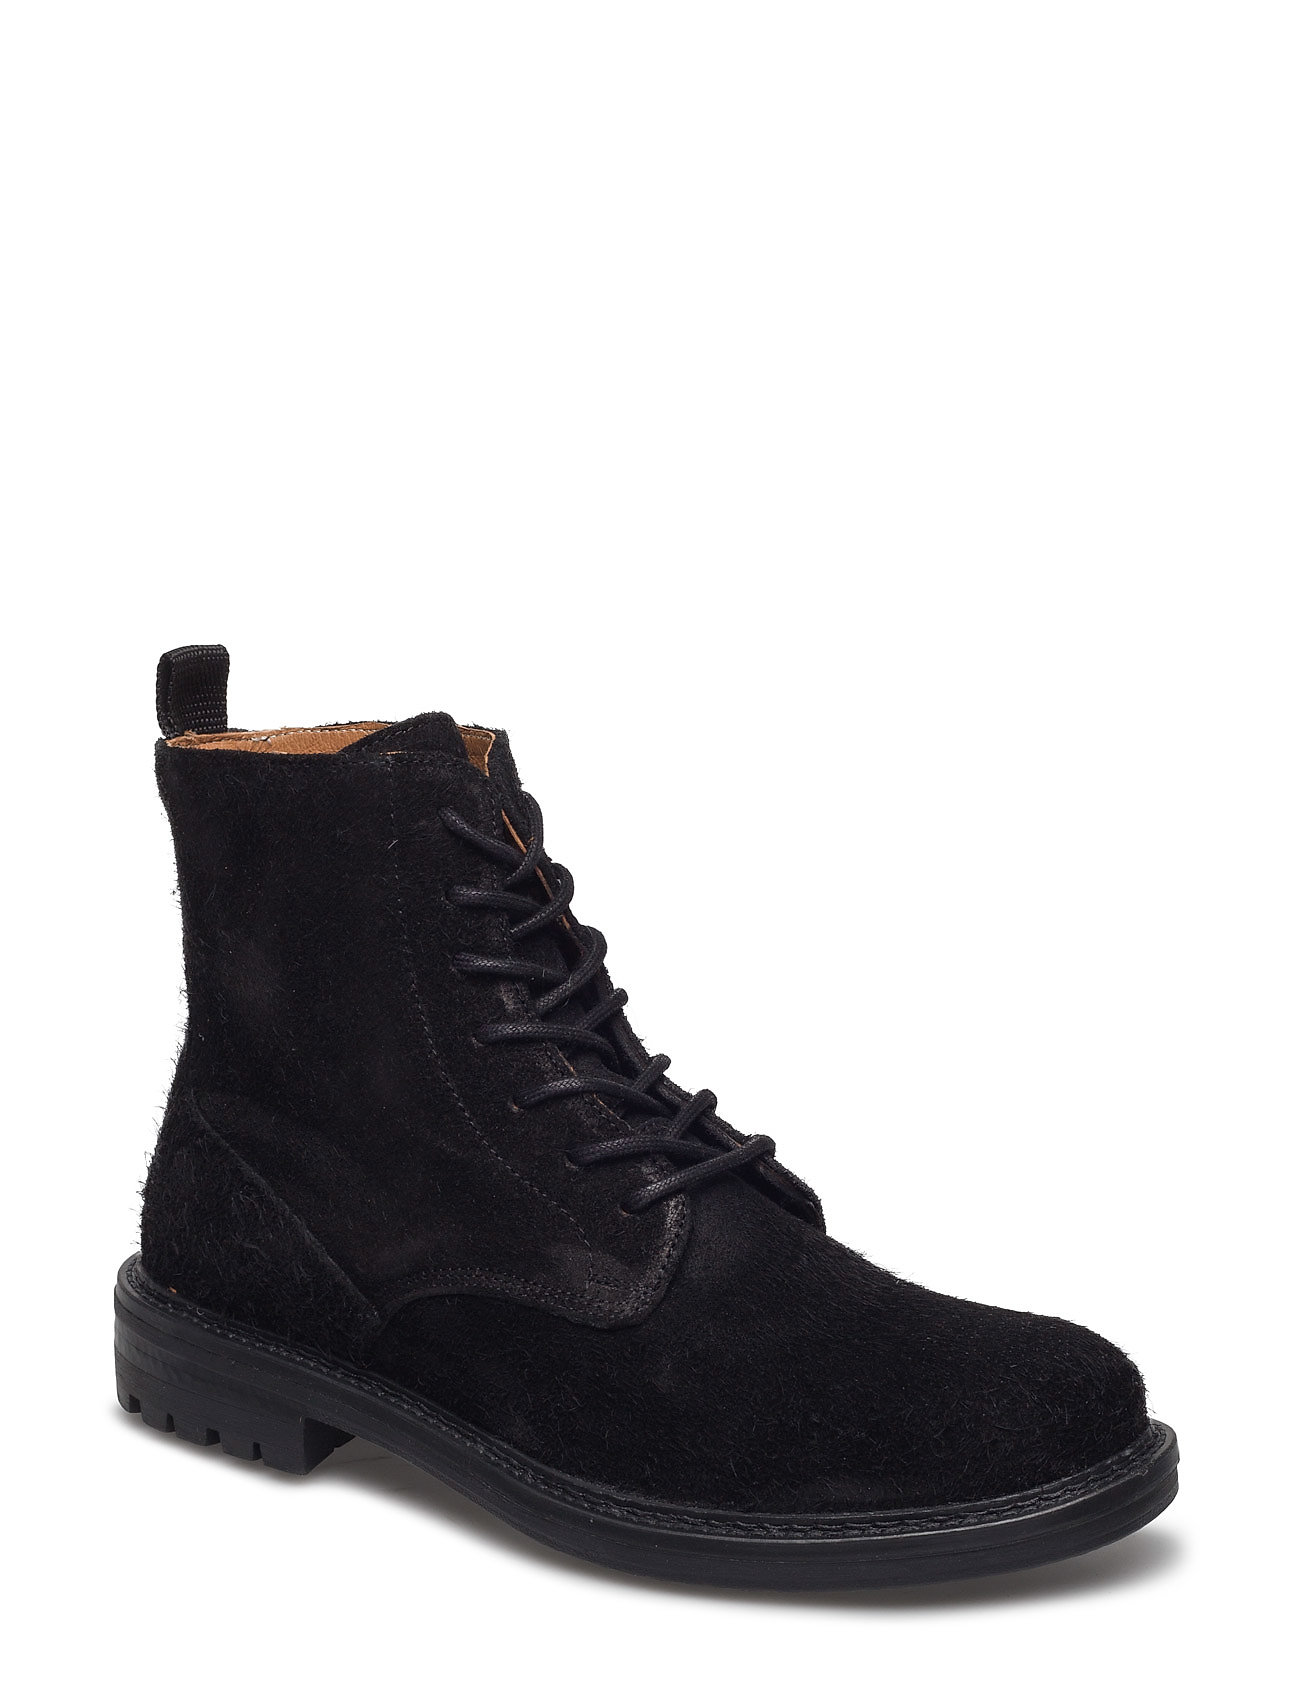 garment project – Army boot på boozt.com dk